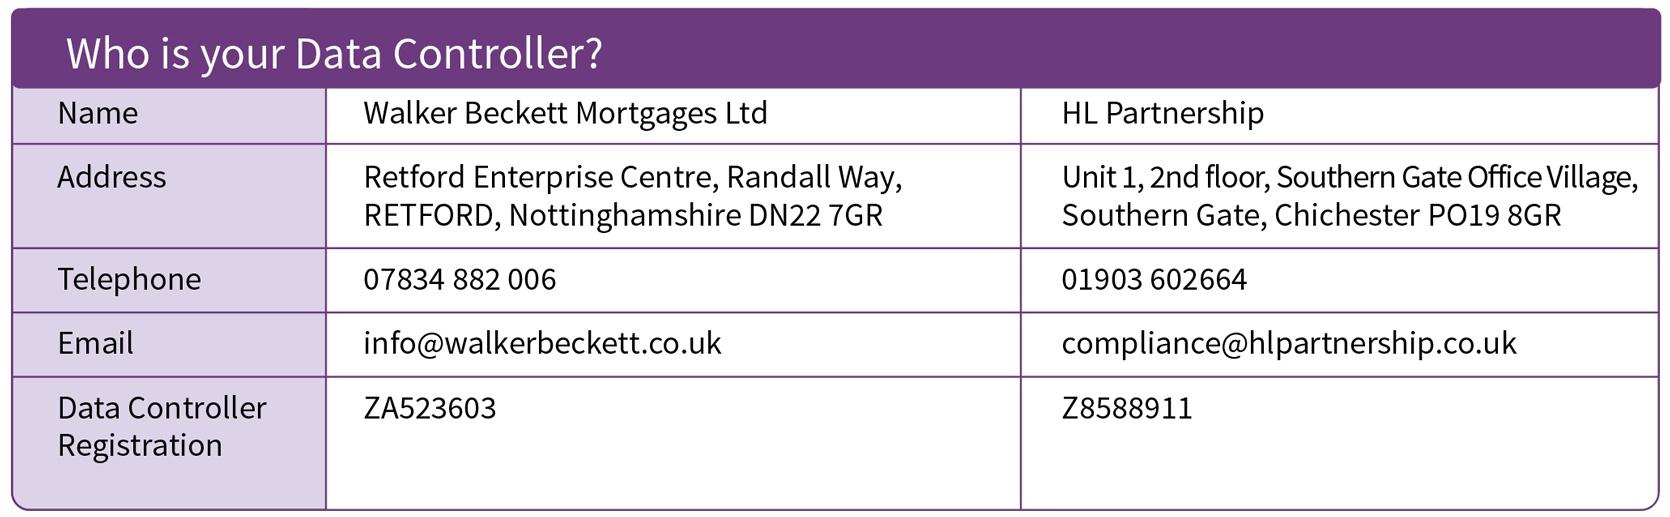 Data Contoller information for Walker Beckett Mortgages